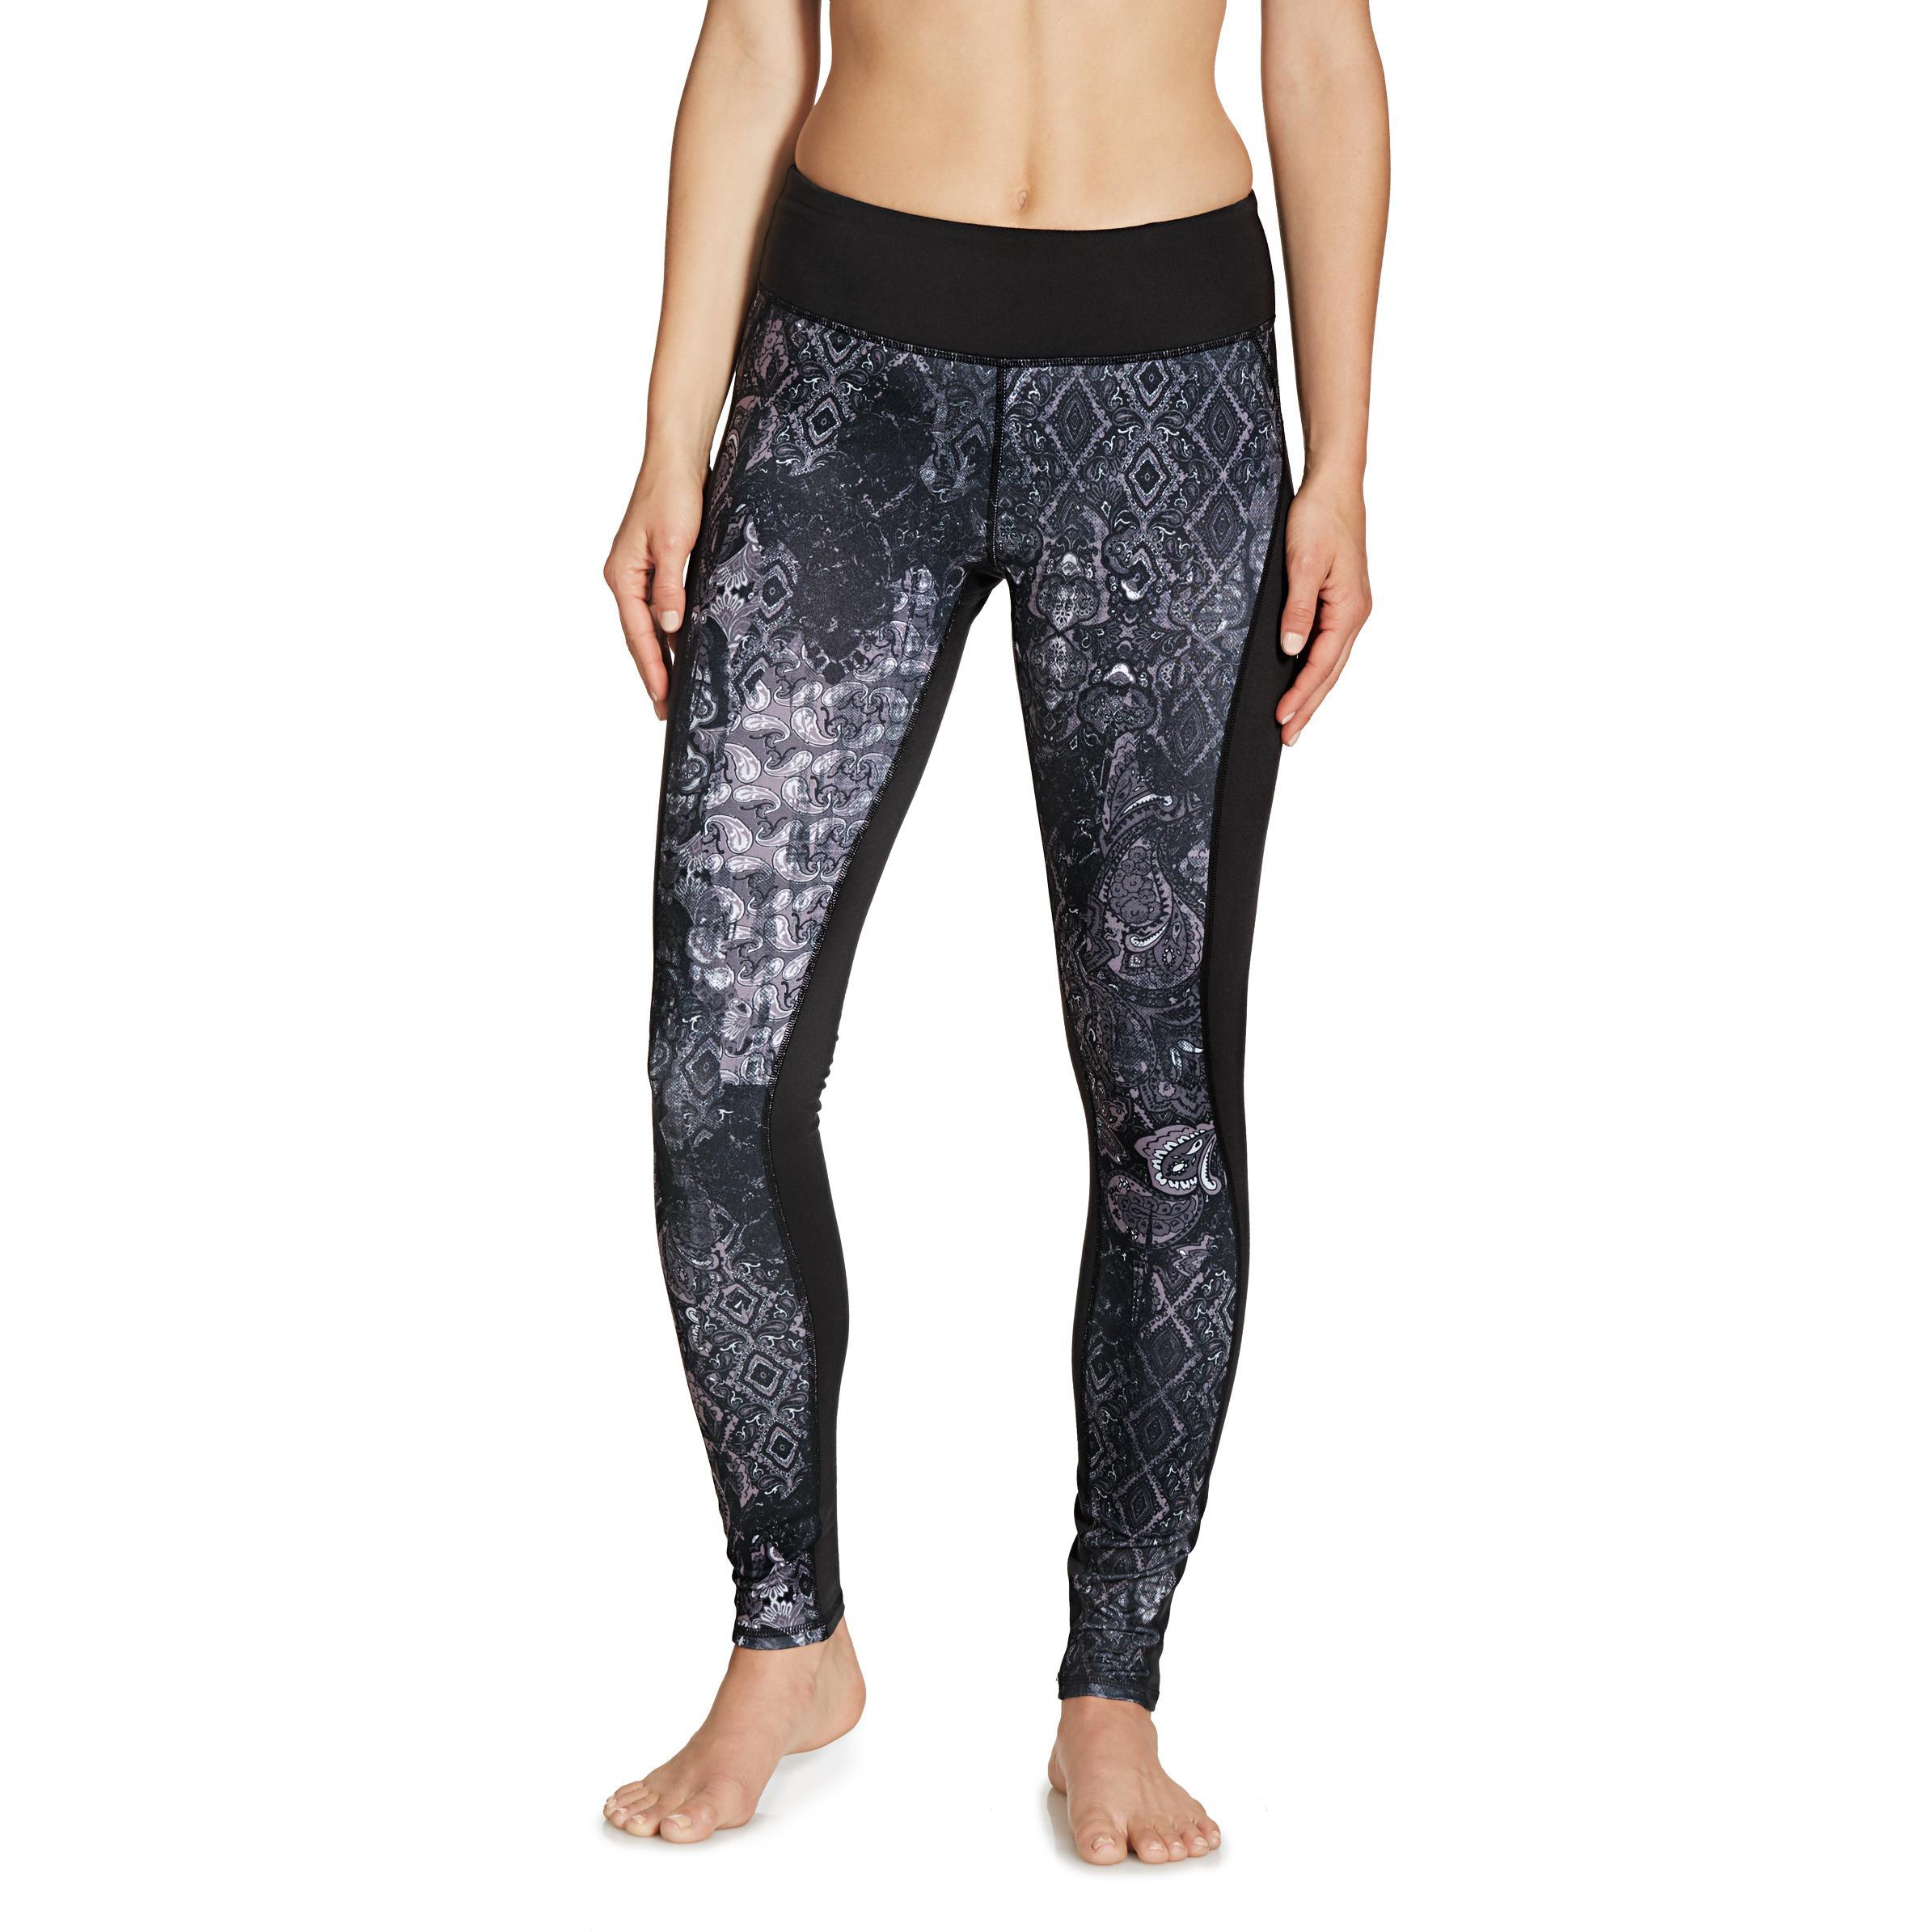 Amazon.com: Gaiam Apparel Womens Luxe Yoga Legging: Sports